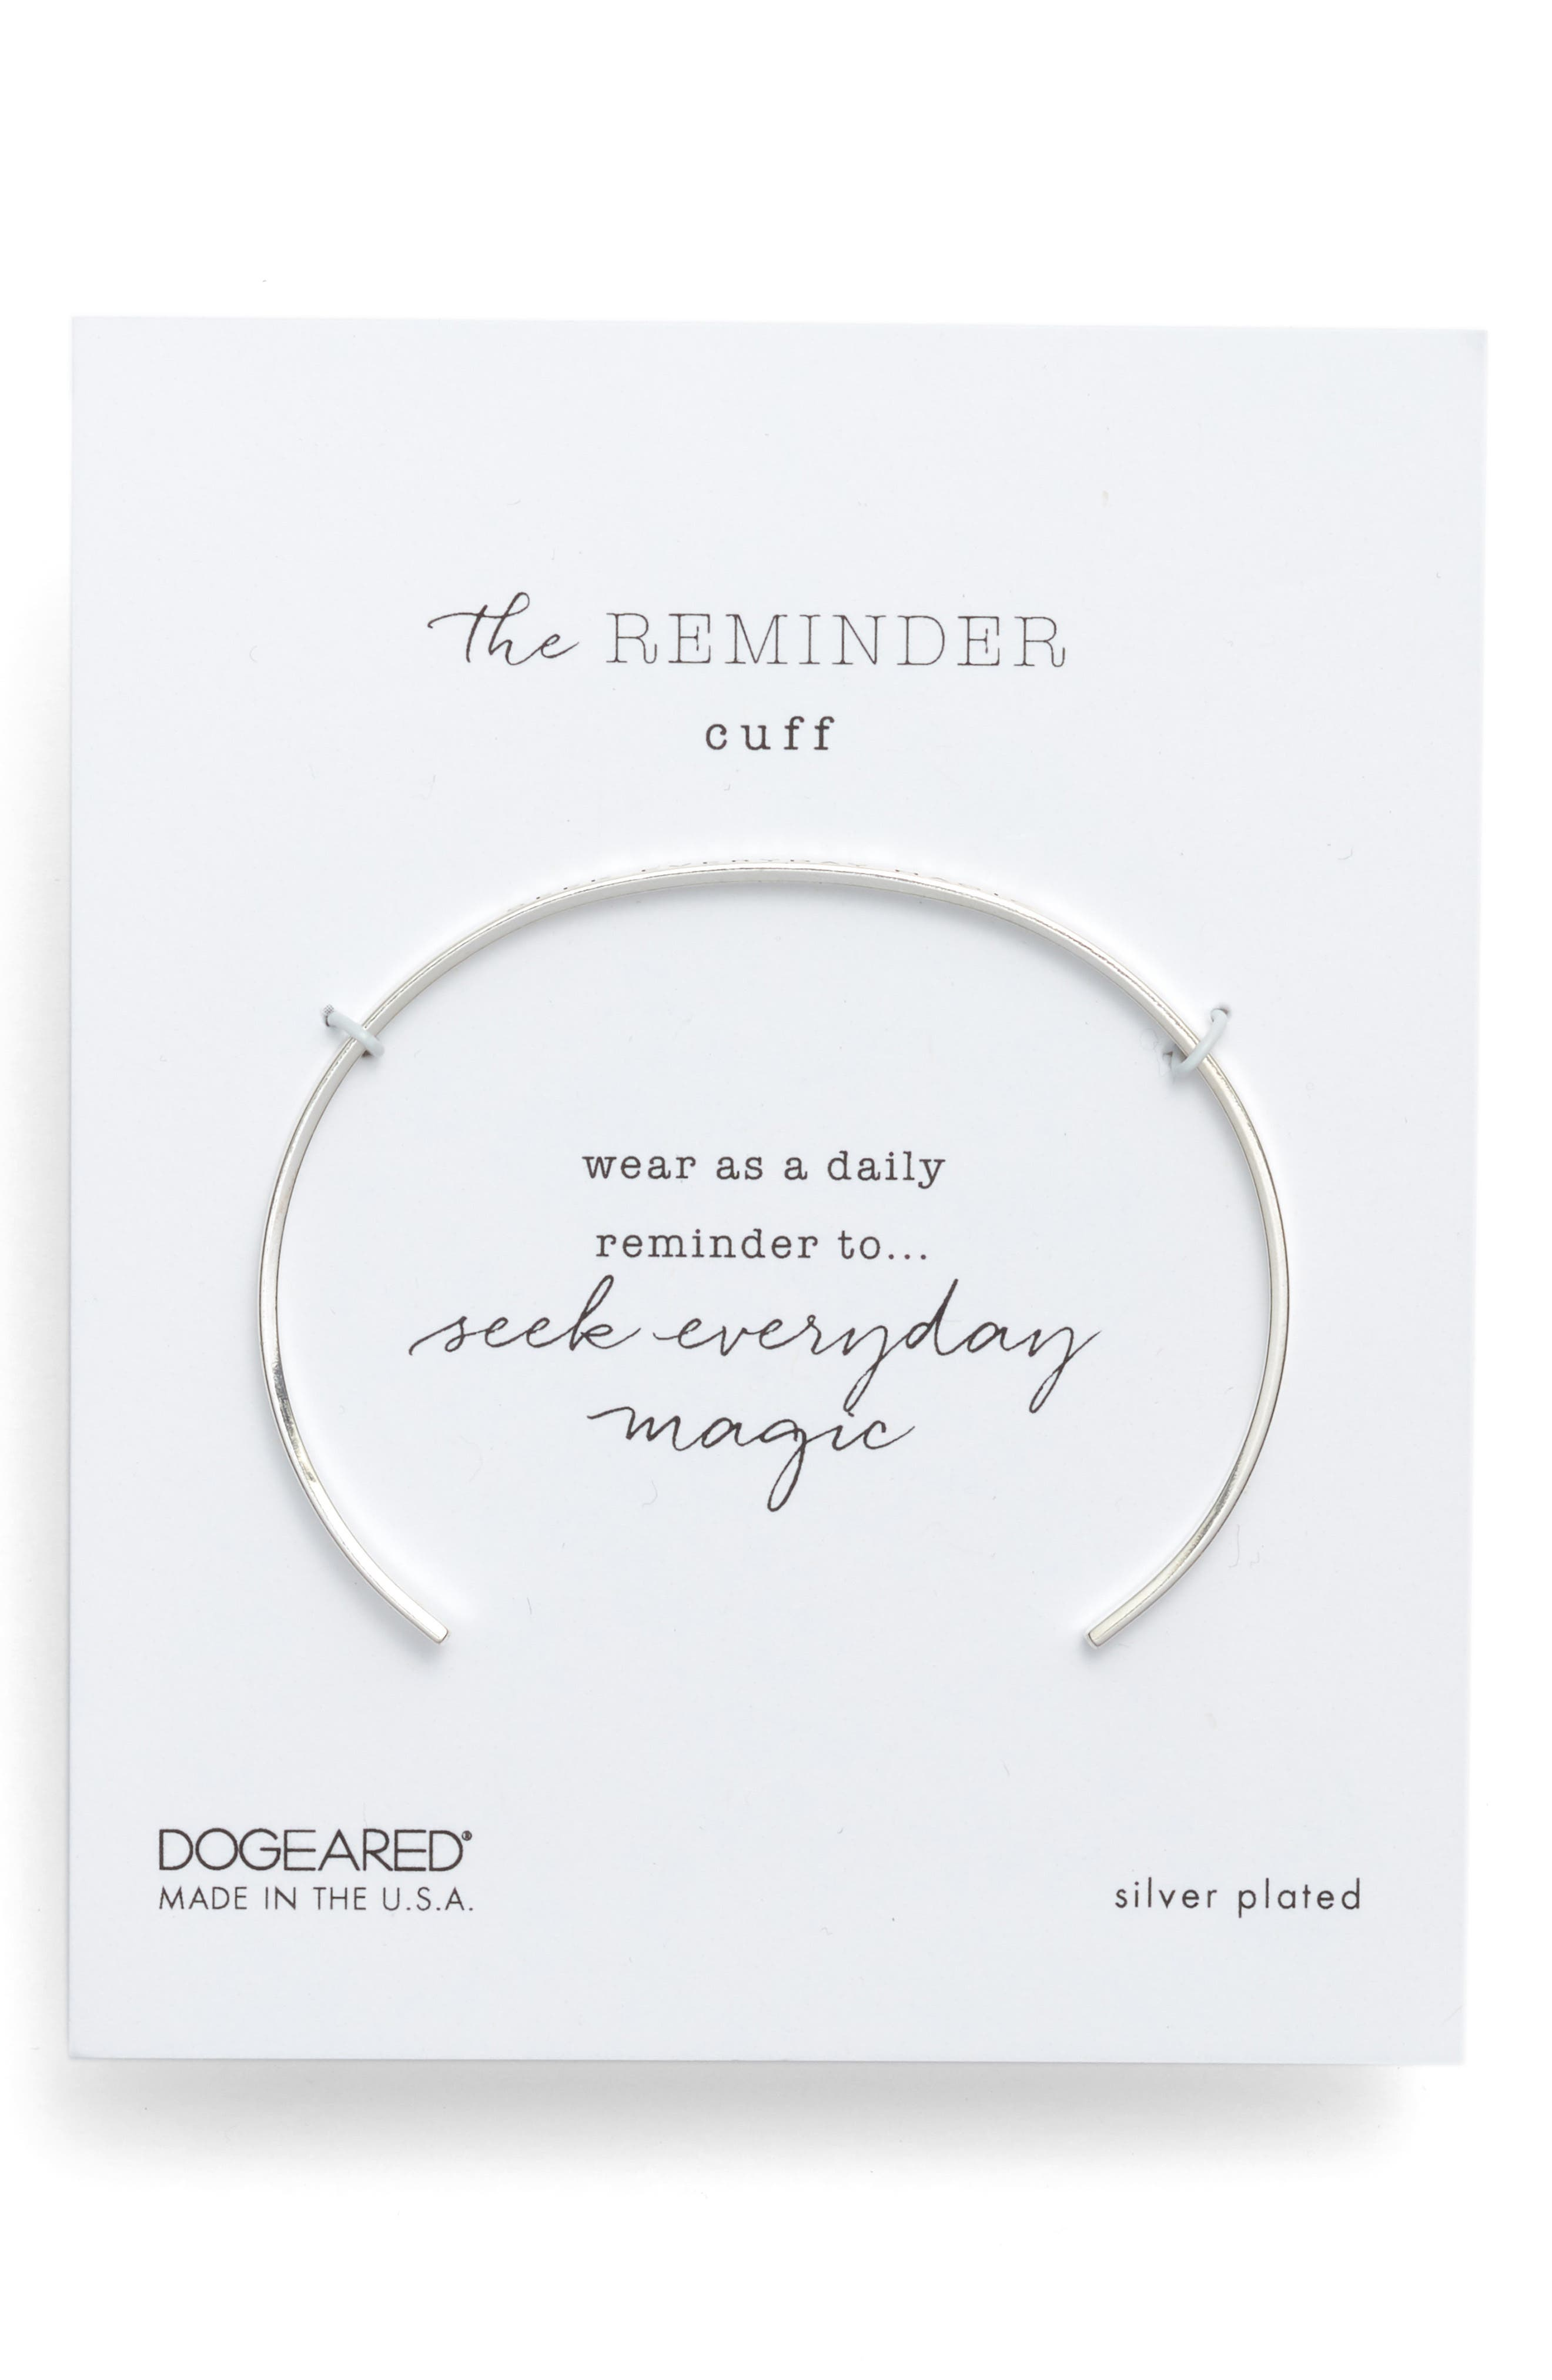 DOGEARED Seek Everyday Magic Thin Cuff Bracelet in Sterling Silver